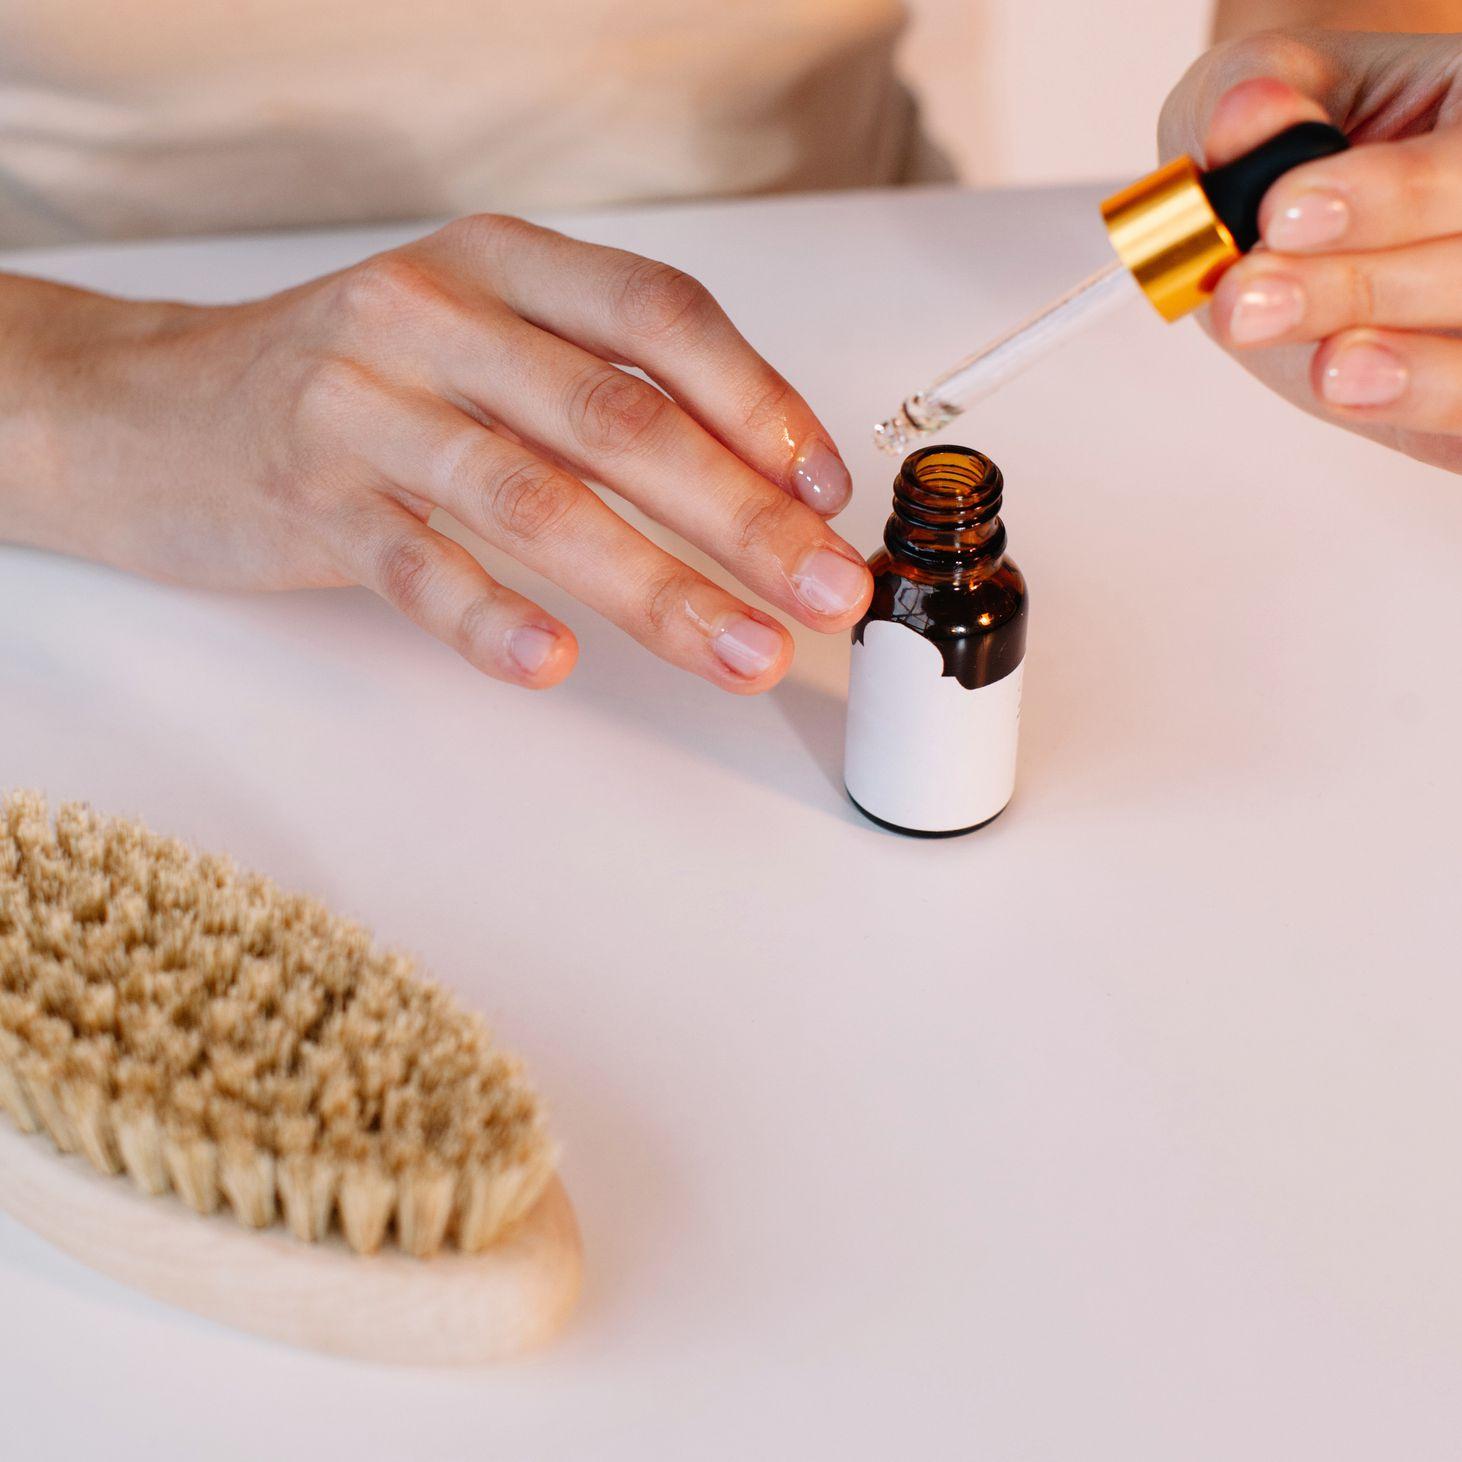 applying cuticle oil